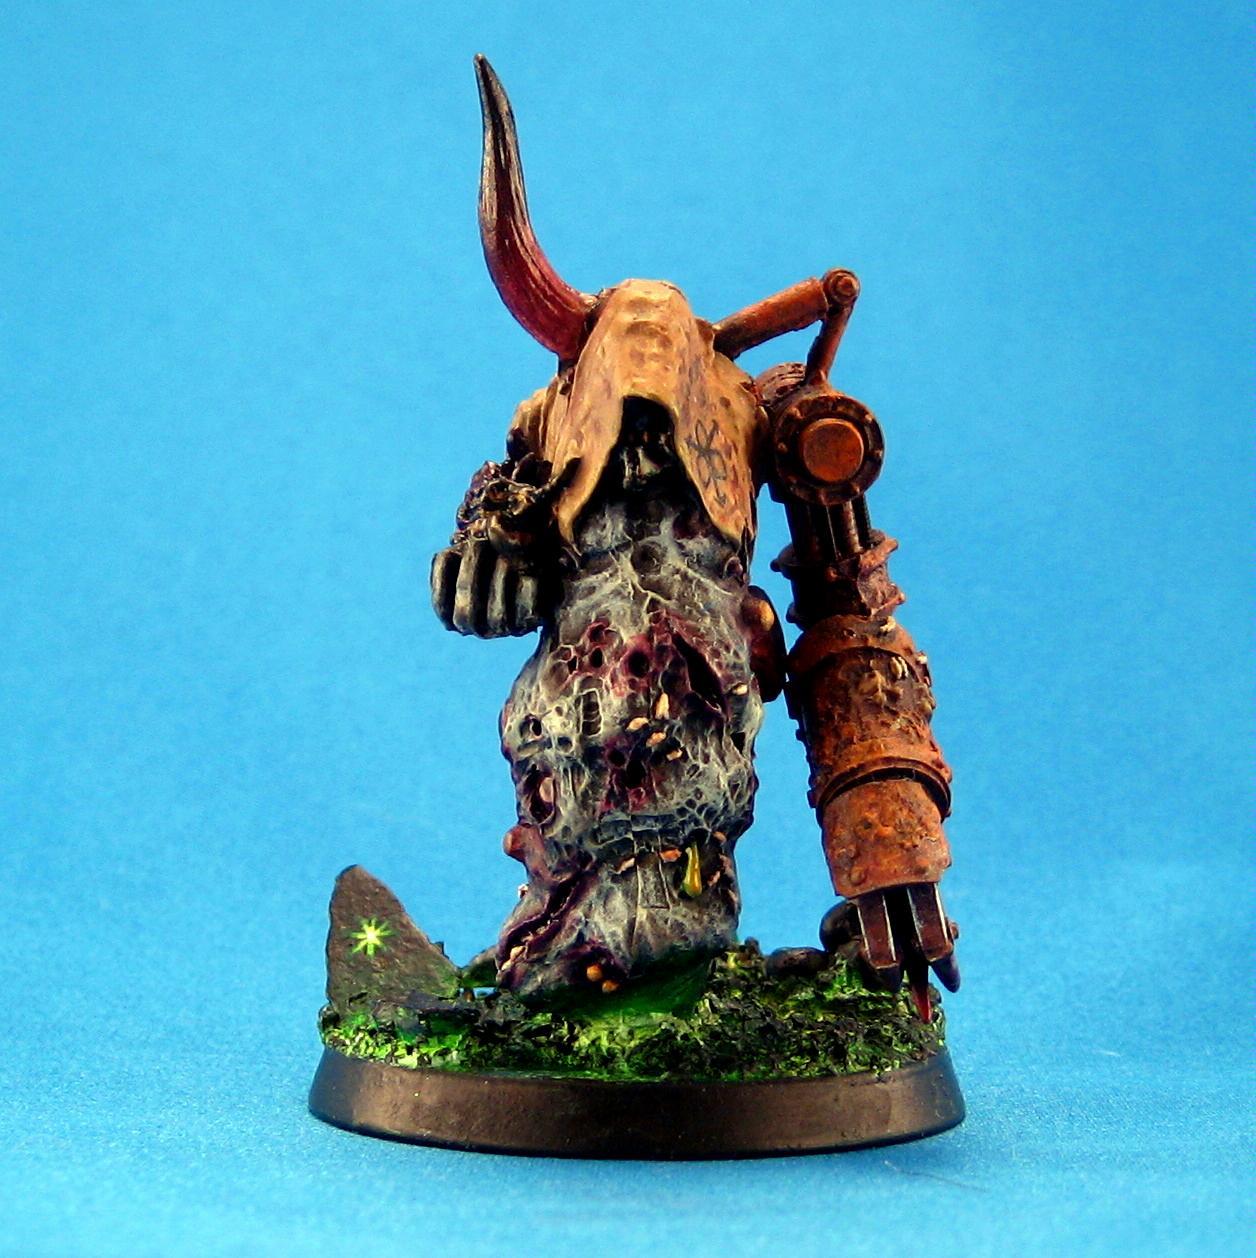 Chaos, Chaos Daemons, Daemon Prince, Daemons, Forge World, Warhammer 40,000